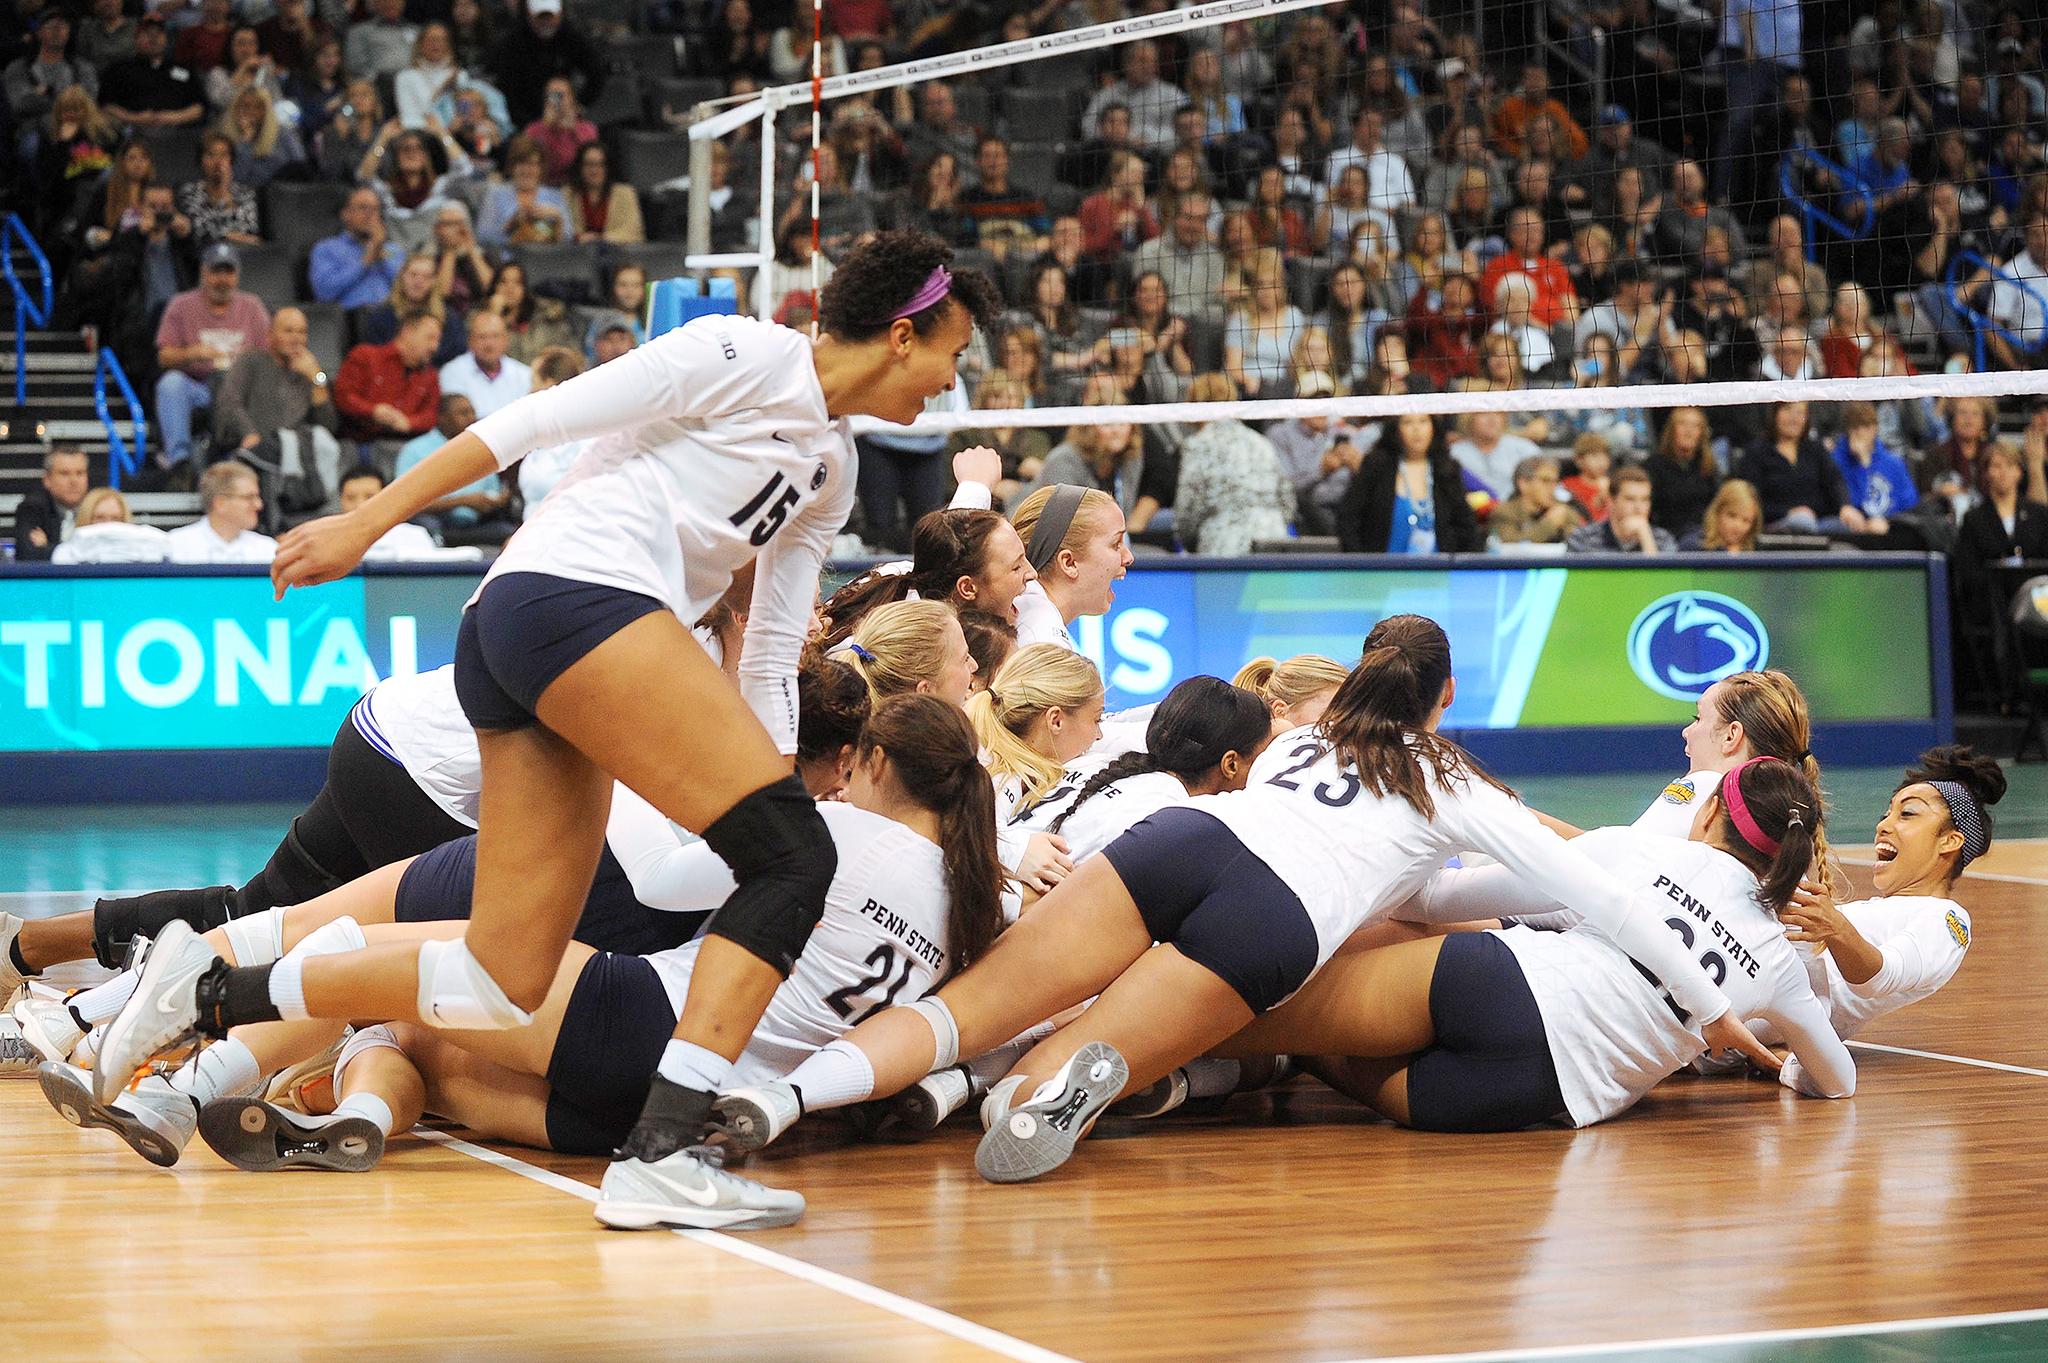 NCAA Volleyball Final: Penn State Celebrates - 2014 NCAA ...